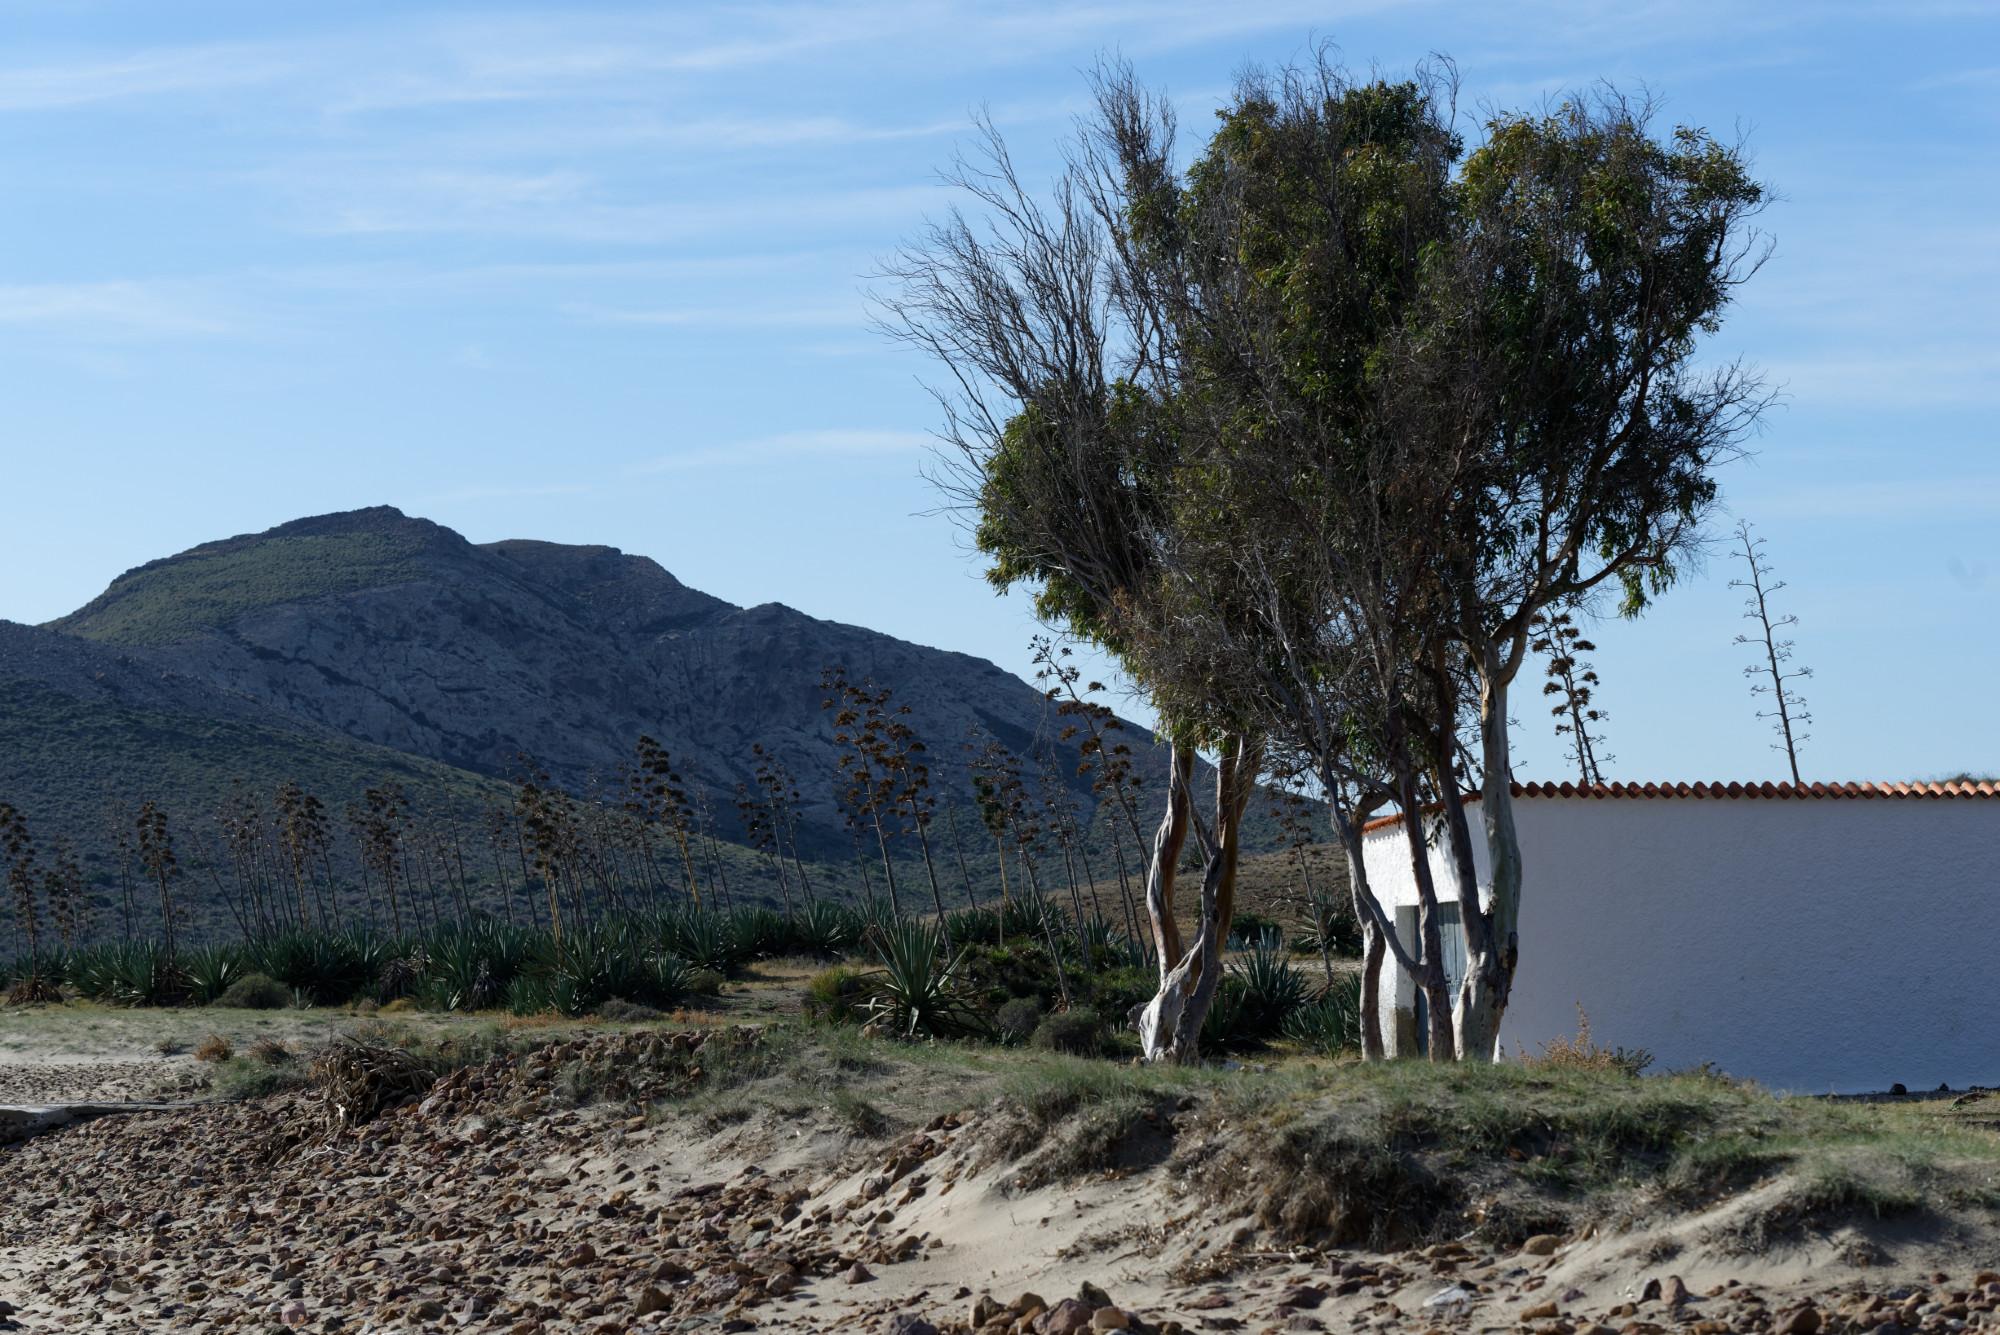 171214-San Jose-Playa de Genoveses (Cabo de Gata-Andalousie) (128)